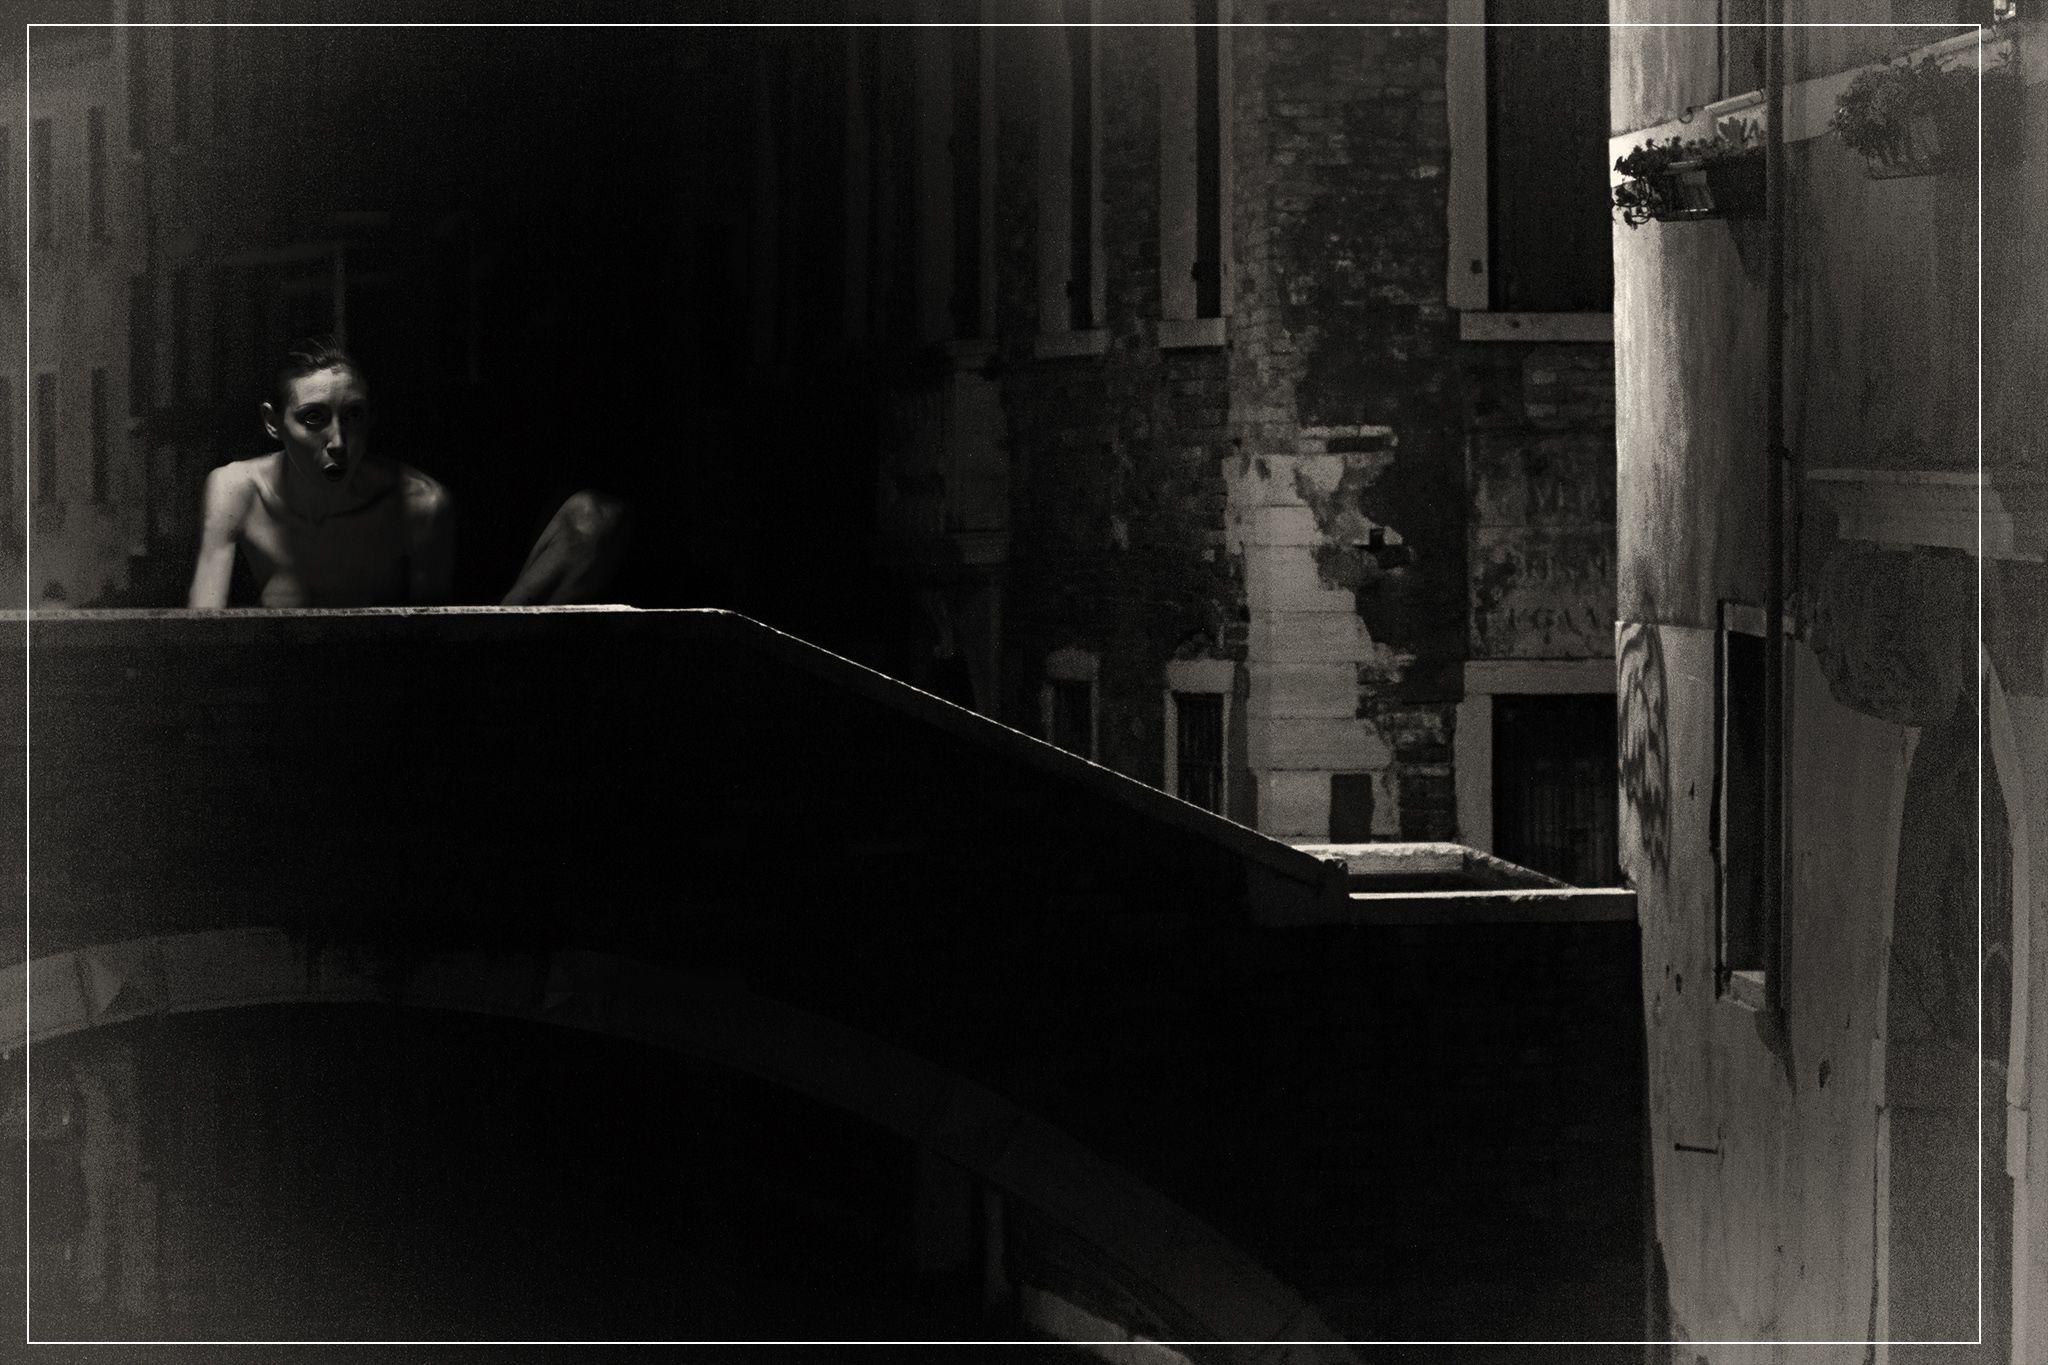 <img src=https://www.urukweb.com/2020/hakarproject/expo/p/20v.jpg><br><br>x